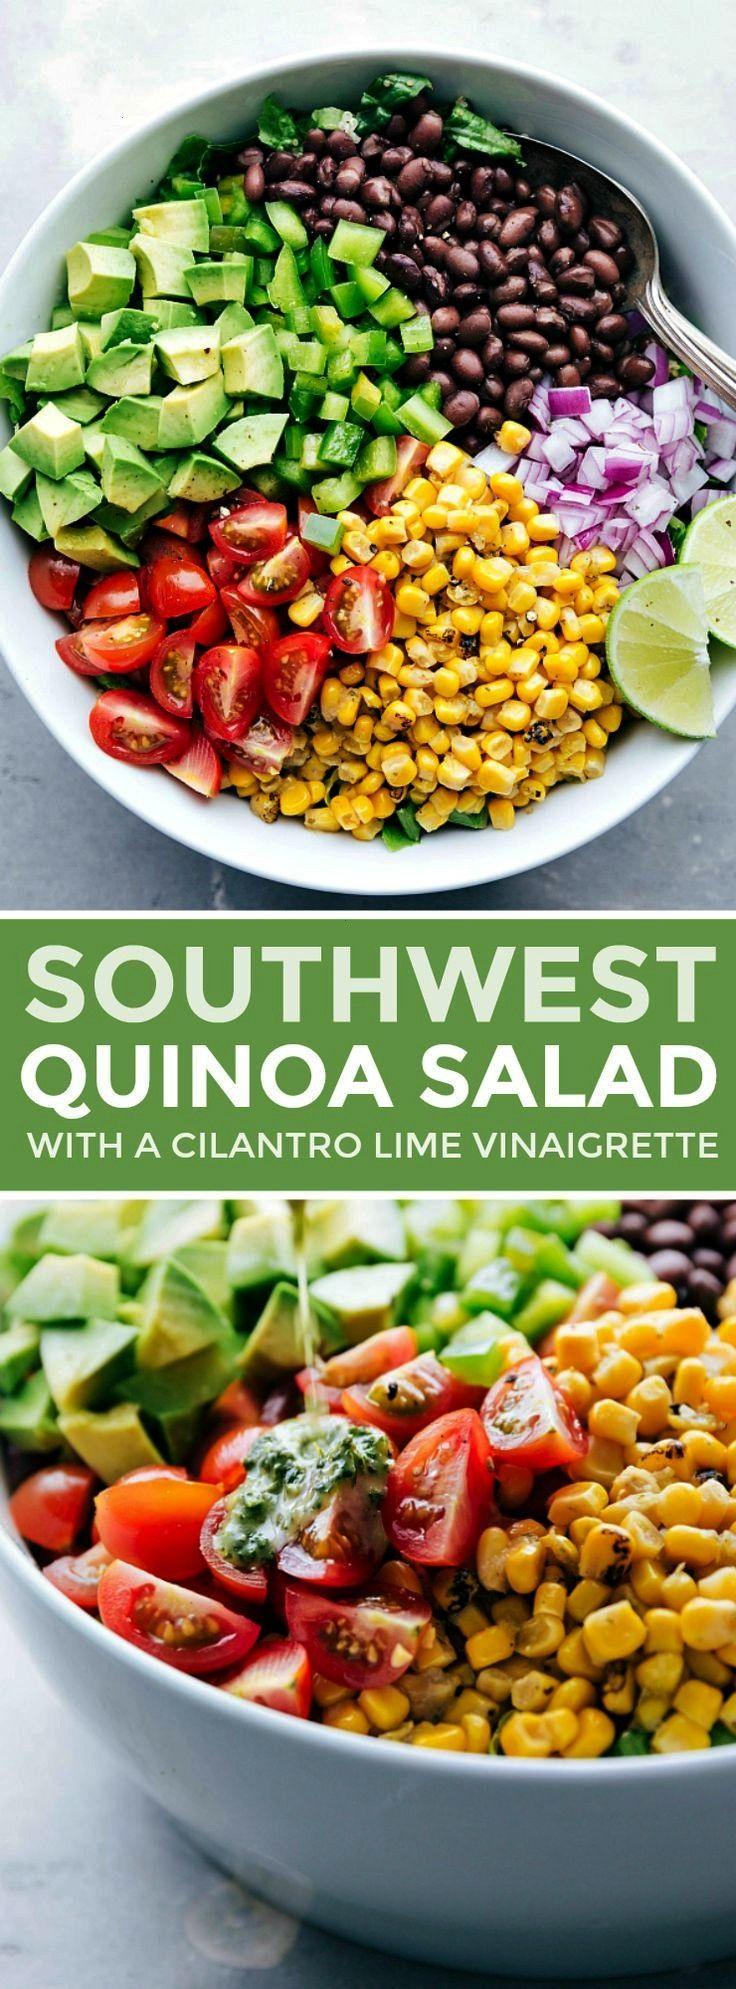 QUINOA SALAD The best ever, healthy Southwest Quinoa Salad with a flavorful cilantro-lime vinaigret